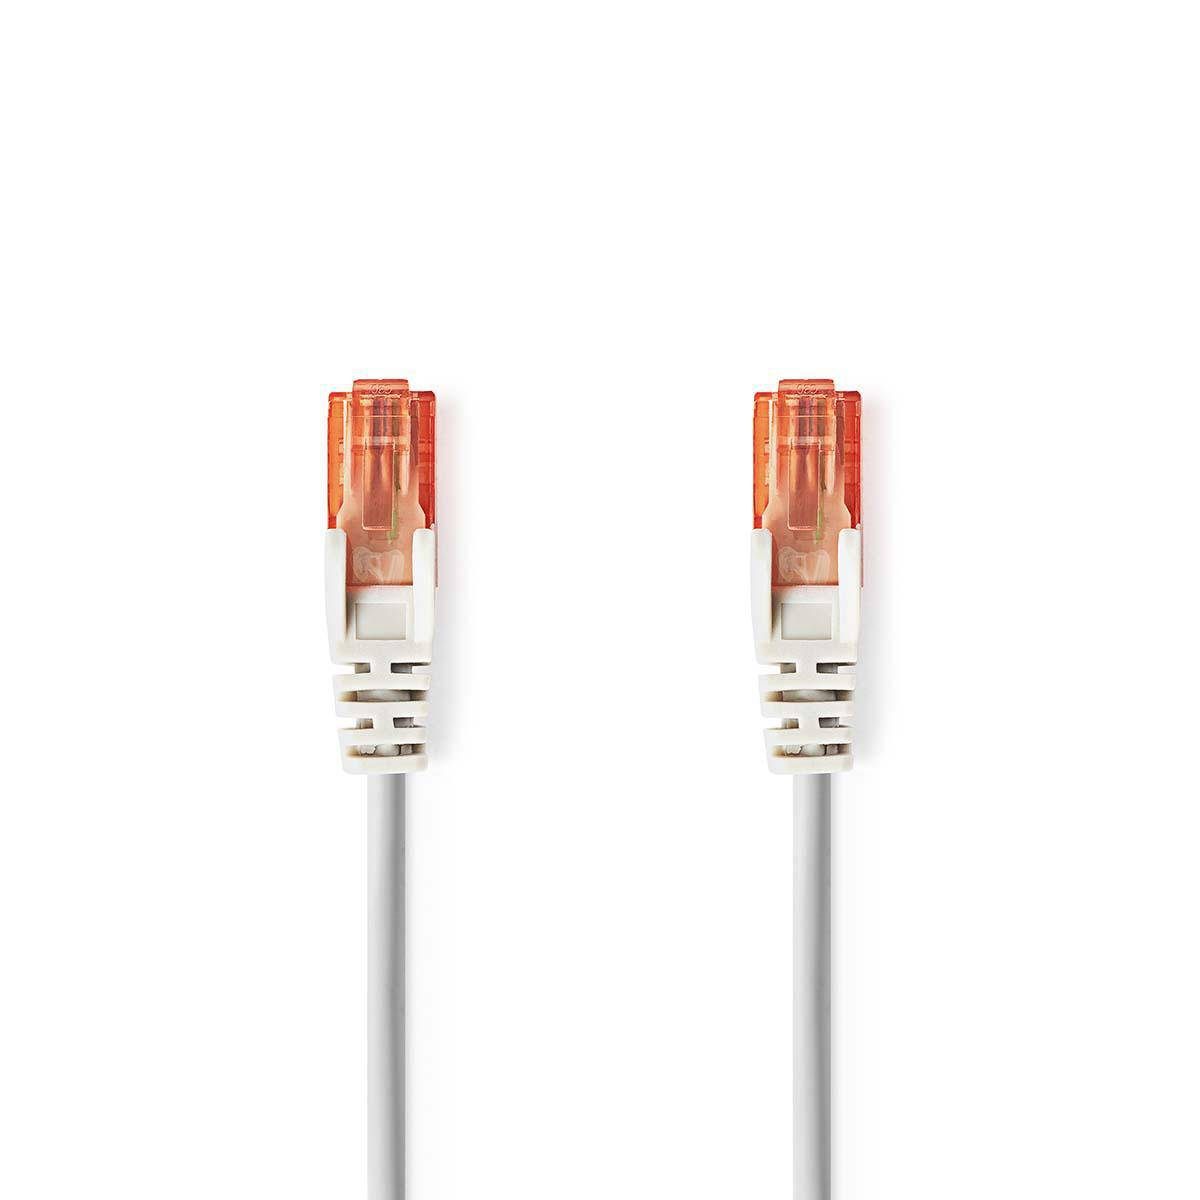 Cablu UTP CAT6 Nedis RJ45 tata - RJ45 tata 5m gri